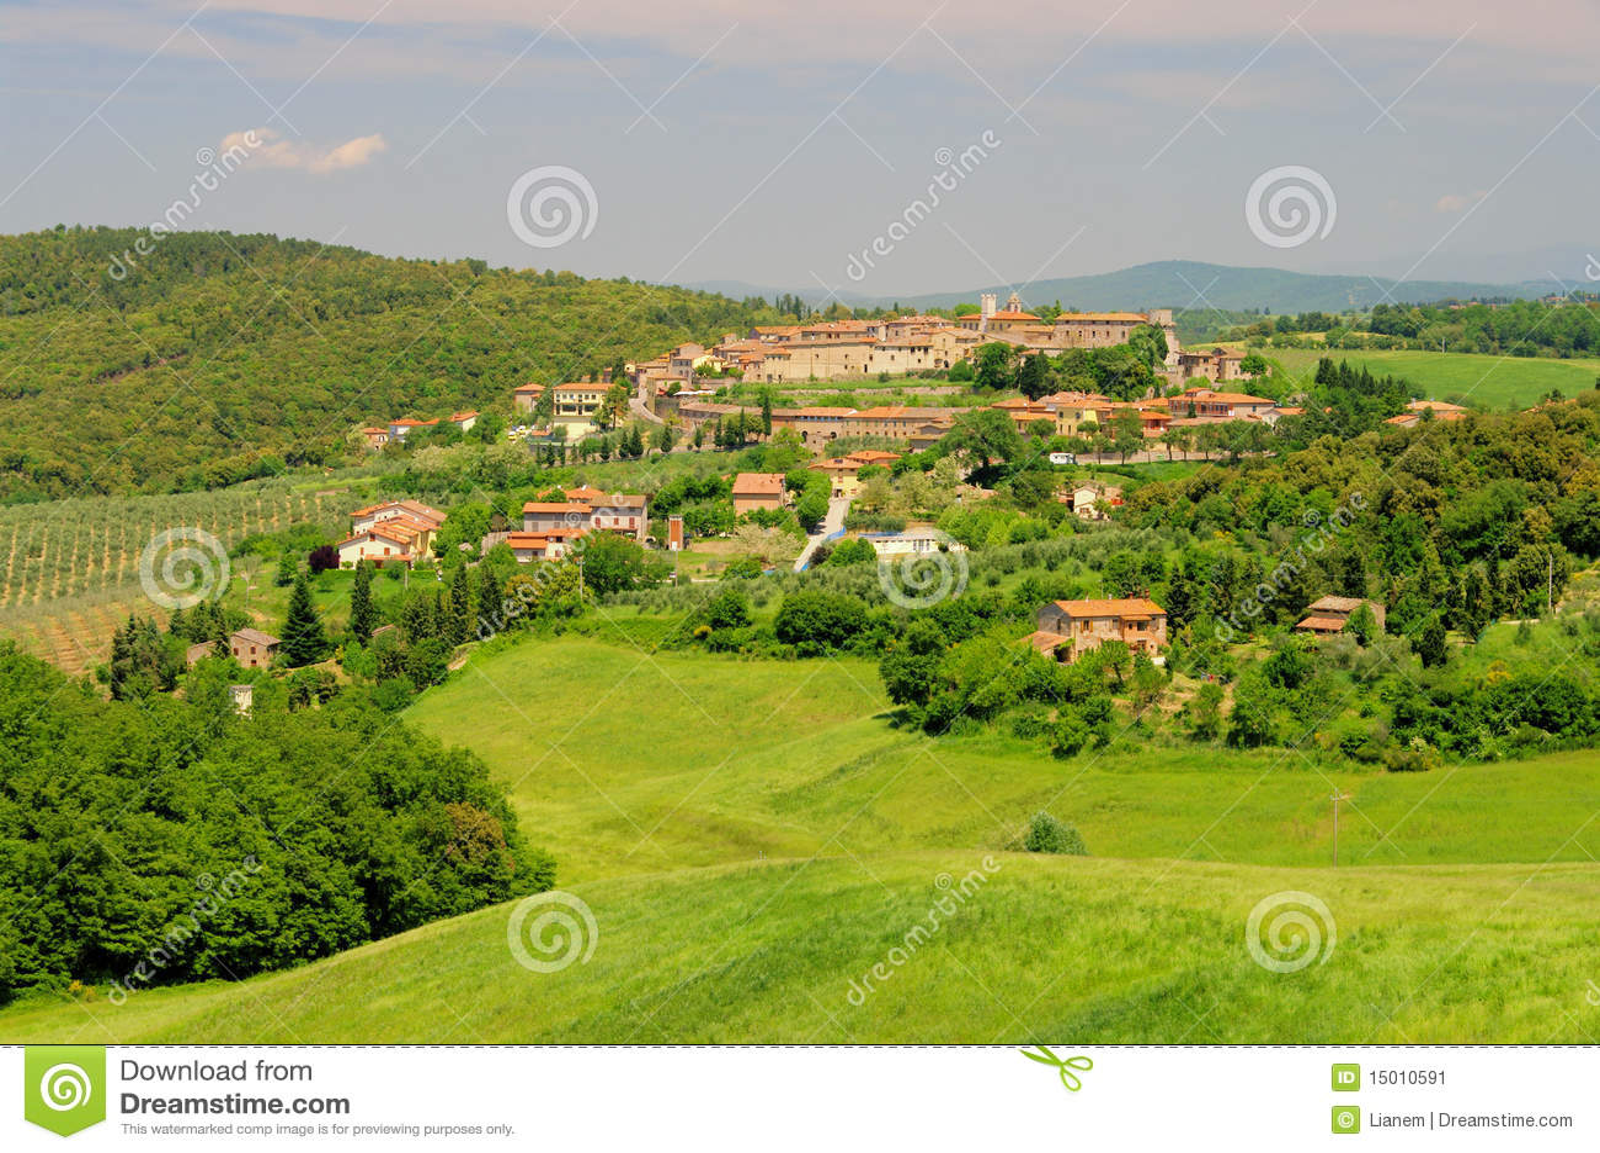 Trequanda Italy  city images : Trequanda Stock Image Image: 15010591